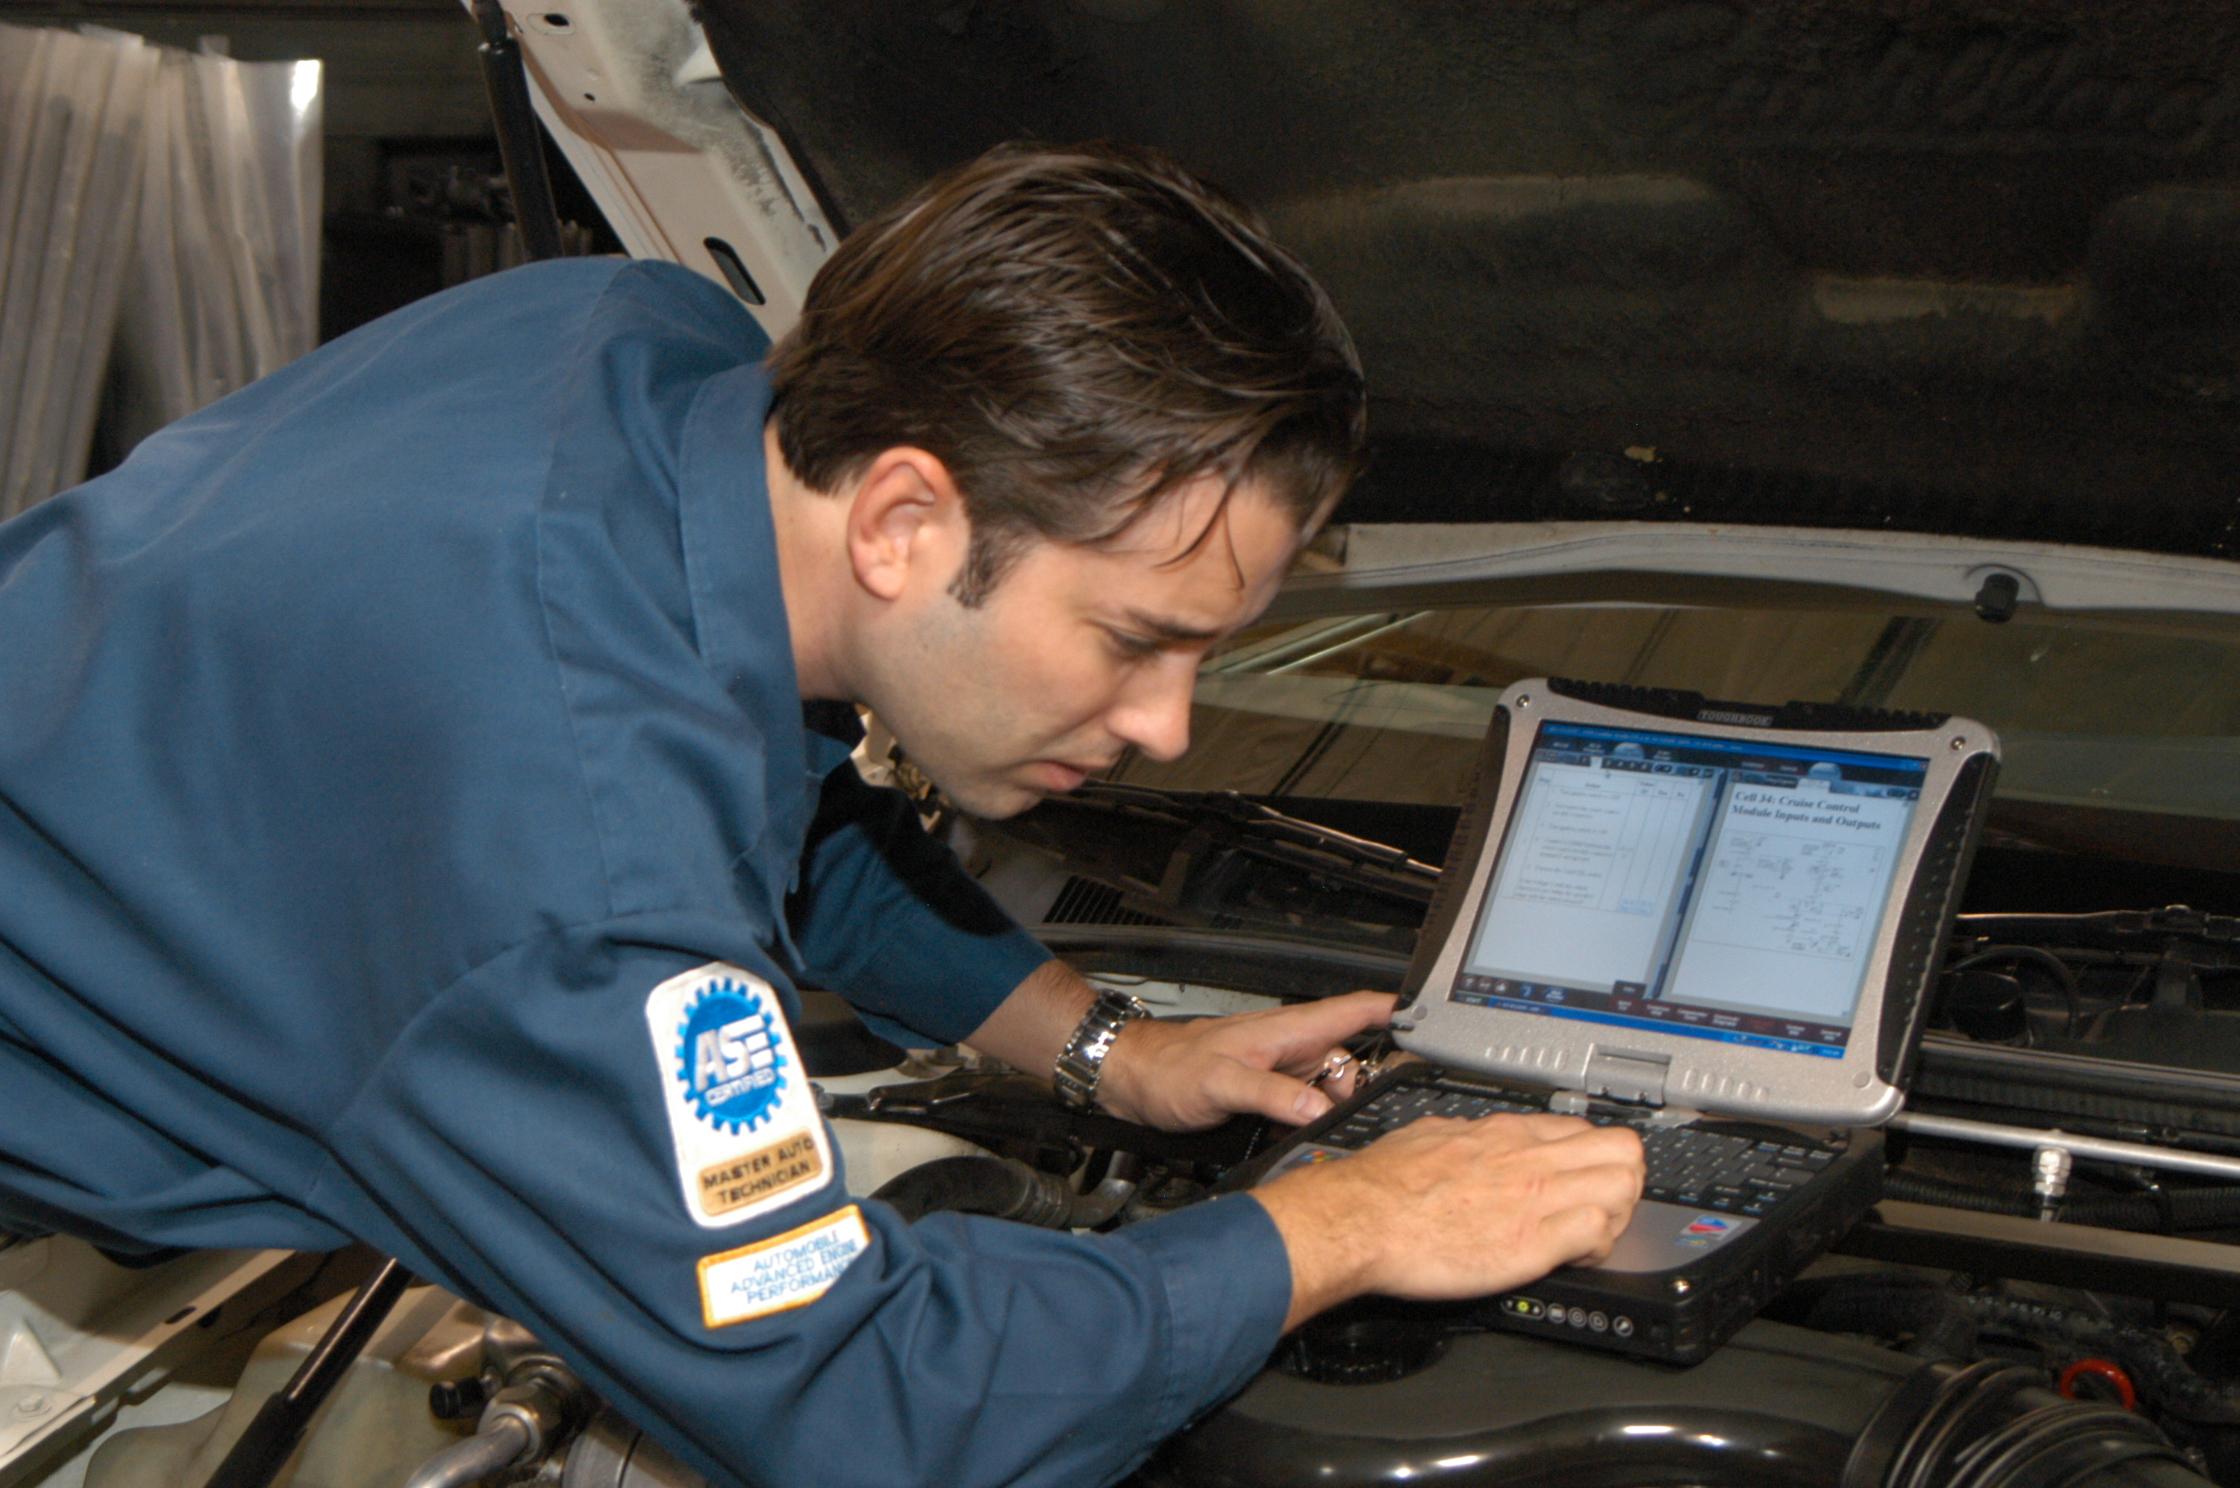 rev it up u0026quot  nationwide auto dealer technician contest helps